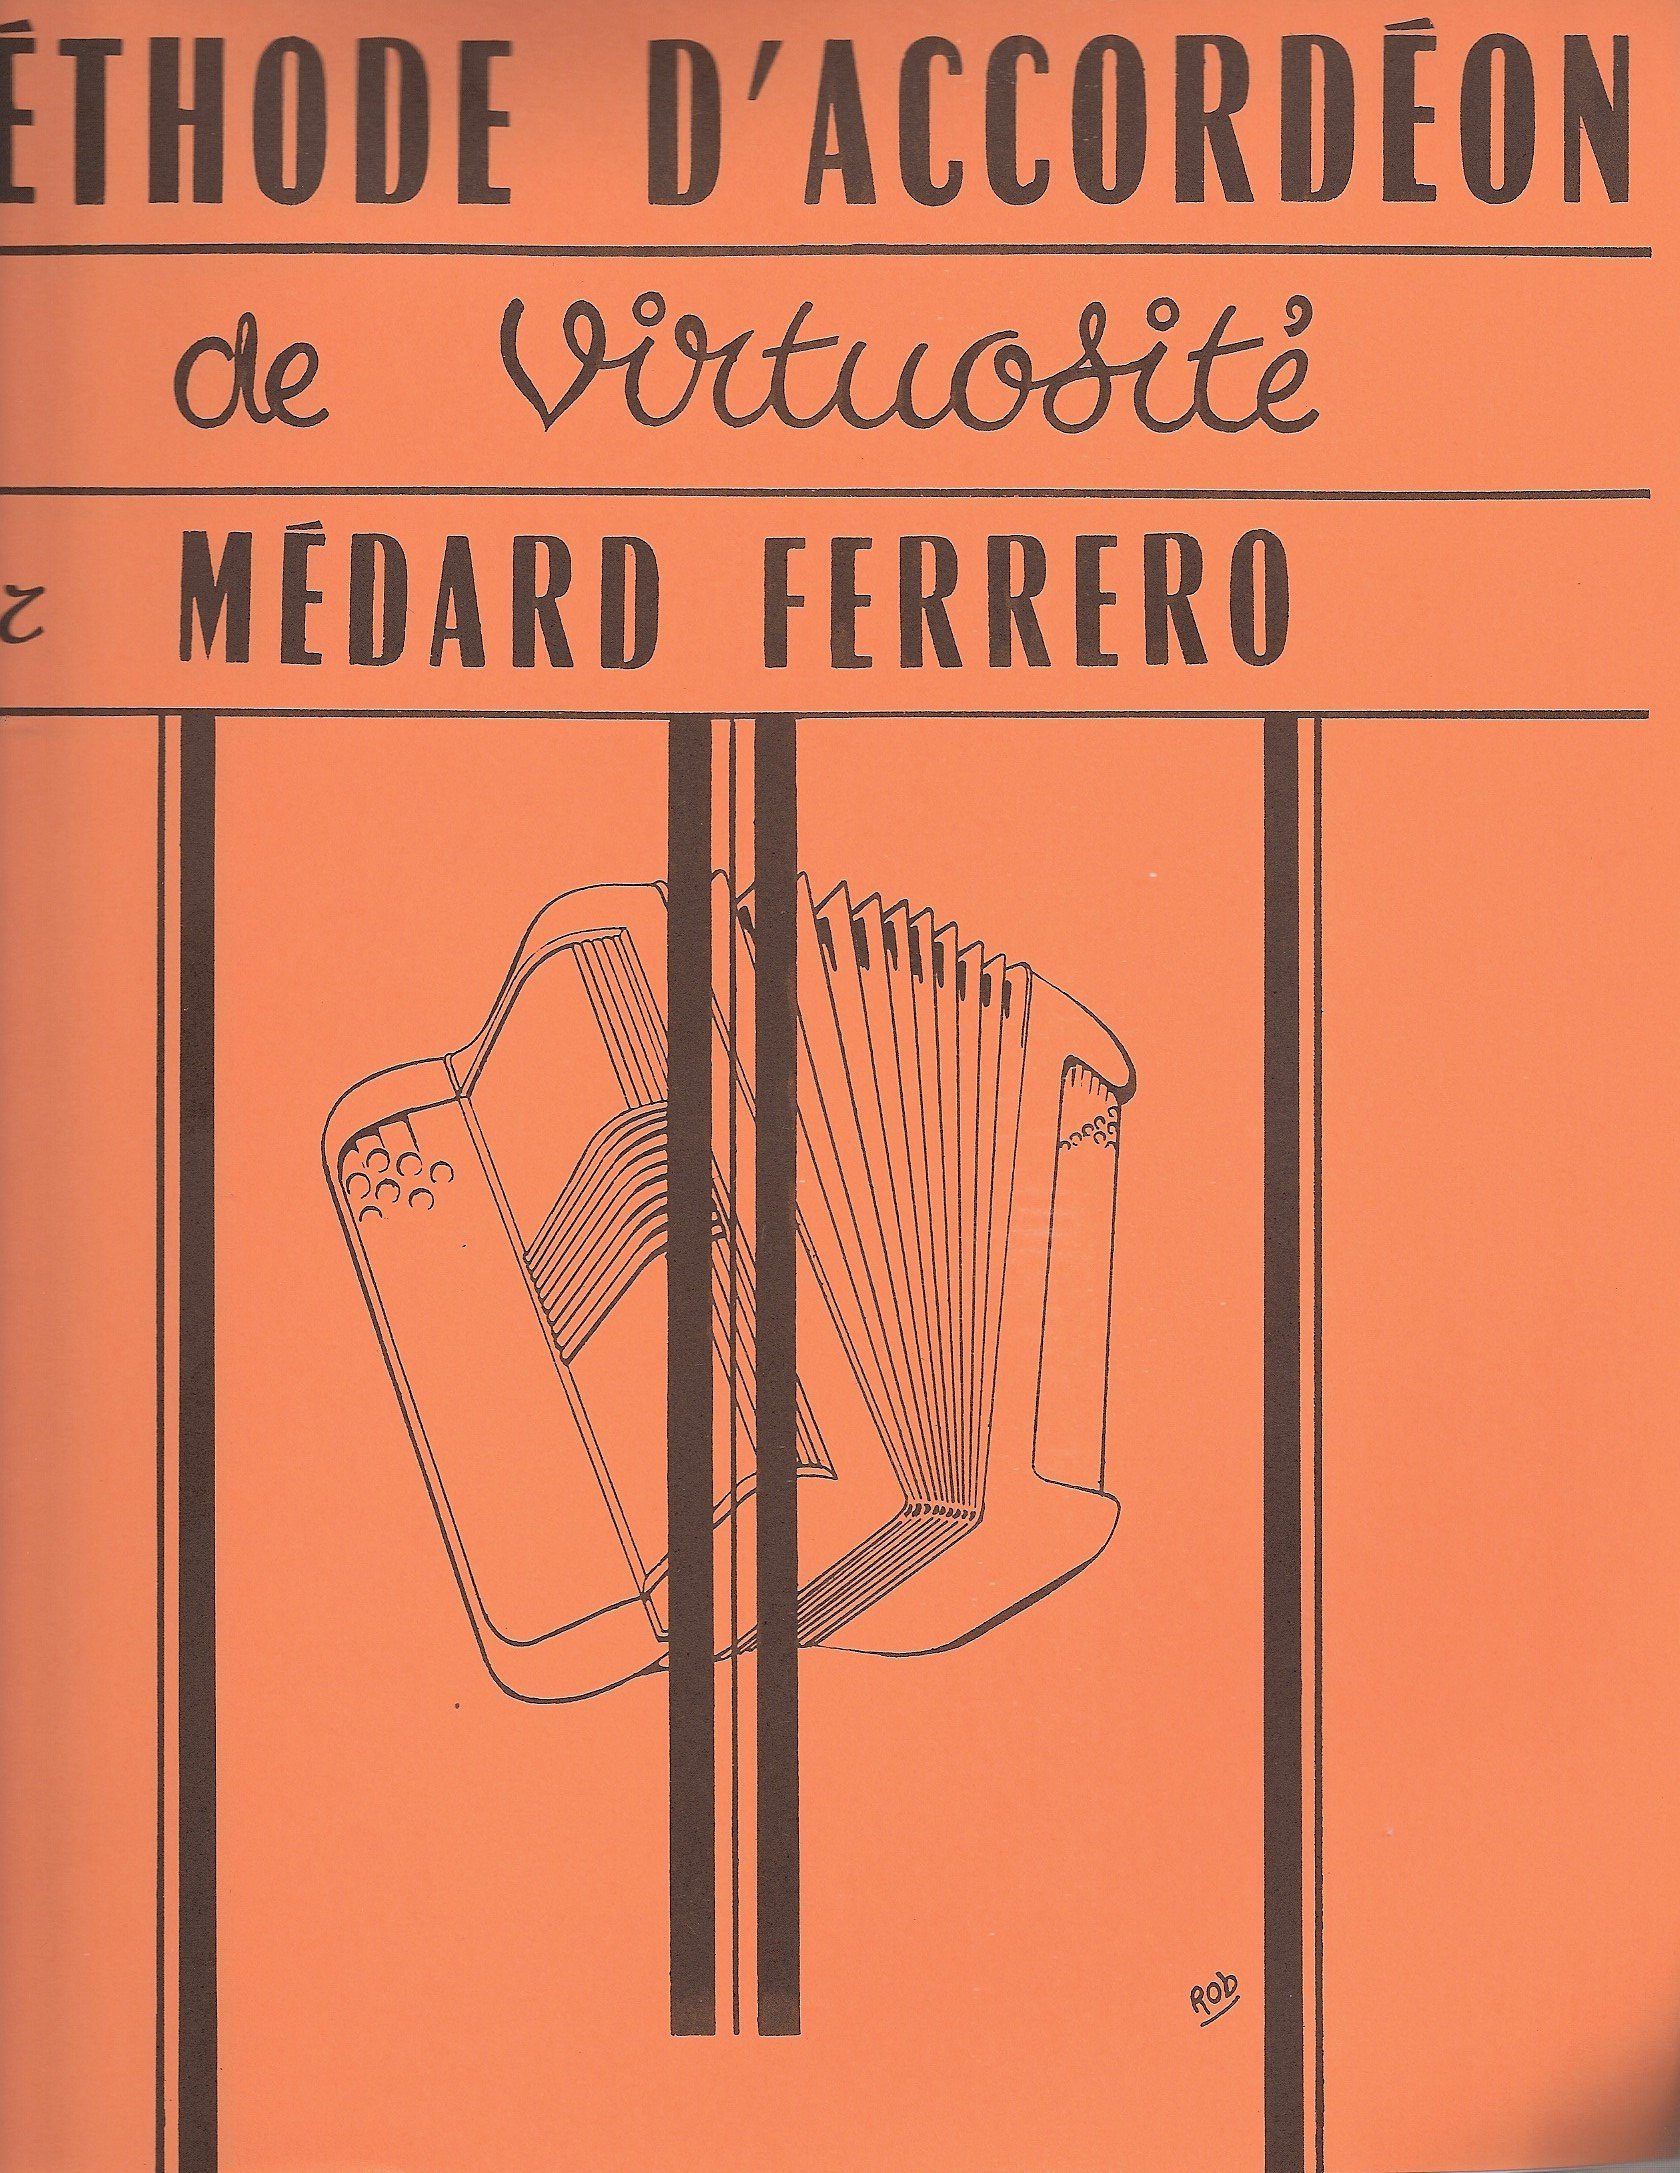 Ferrero : méthode d'accordéon virtuosité Partition – 1948 Médard ferrero B000WEUPCC 20e siècle